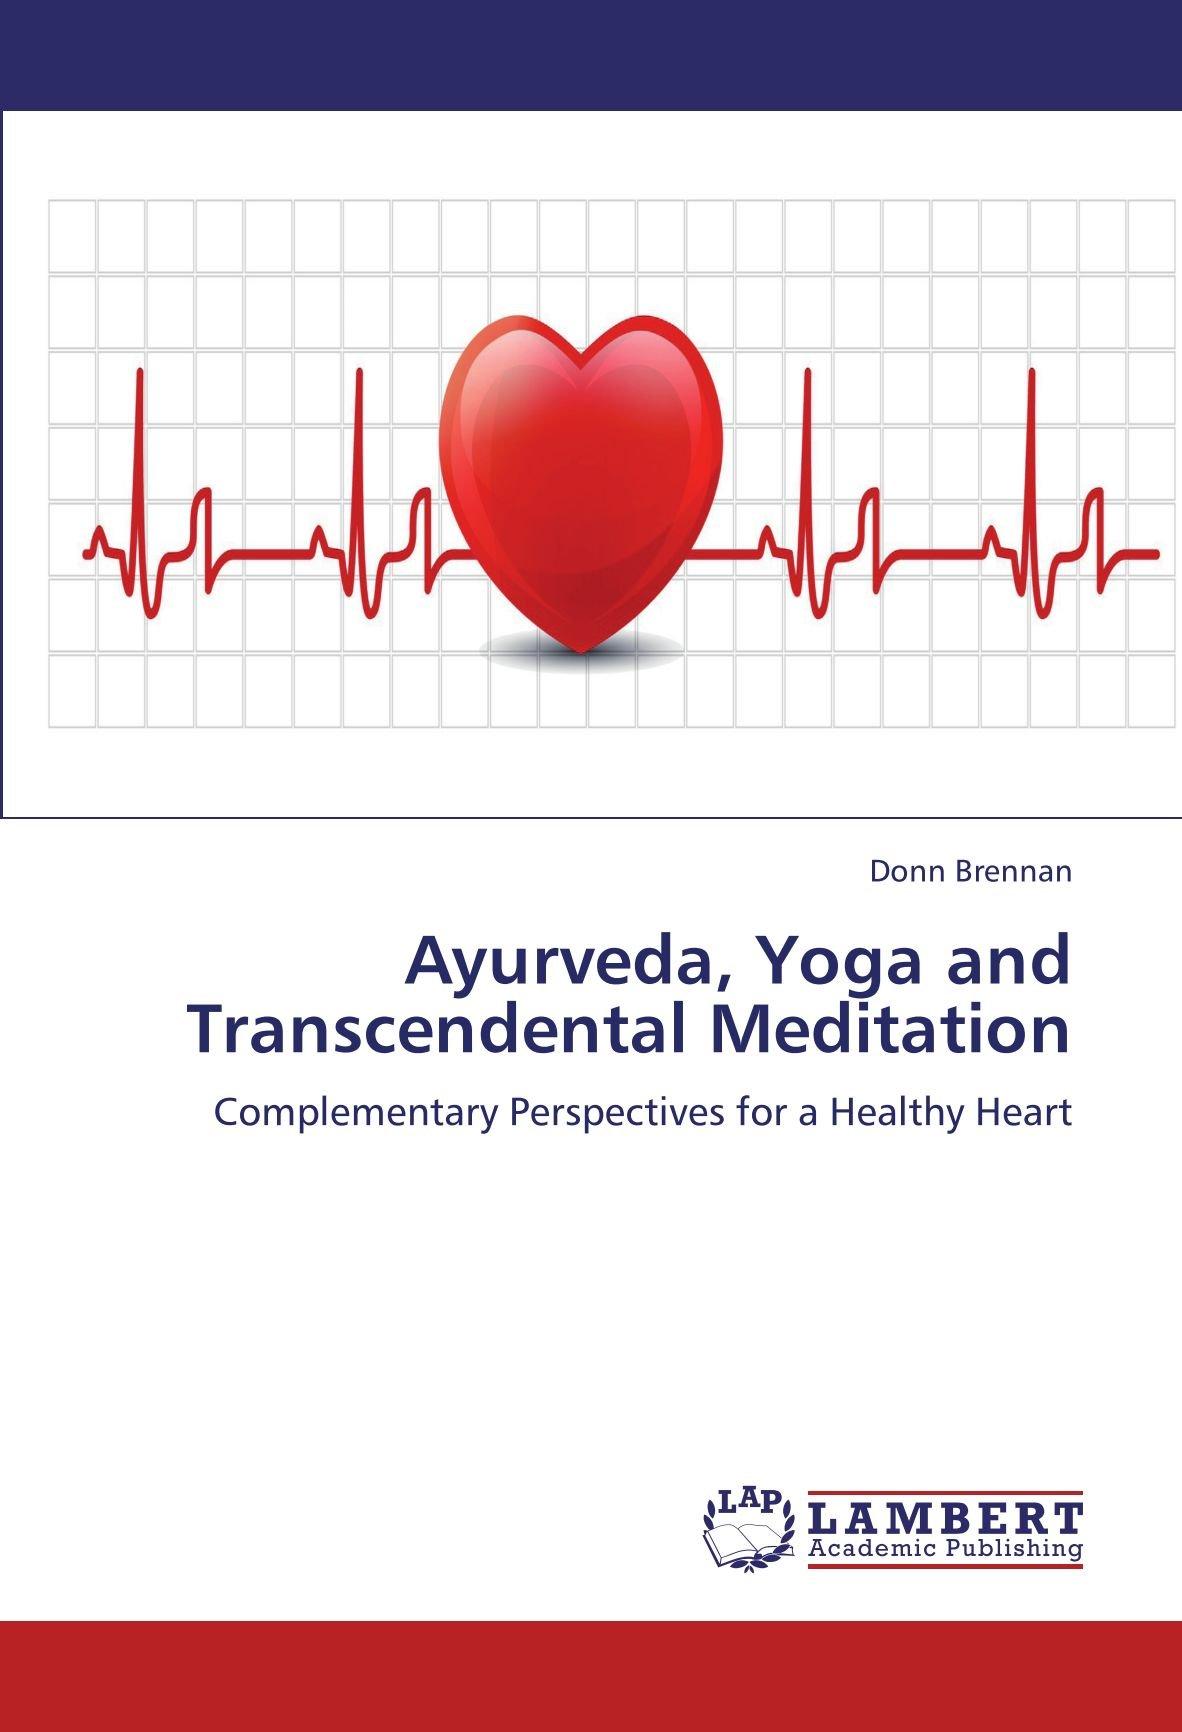 Ayurveda, Yoga and Transcendental Meditation: Complementary ...